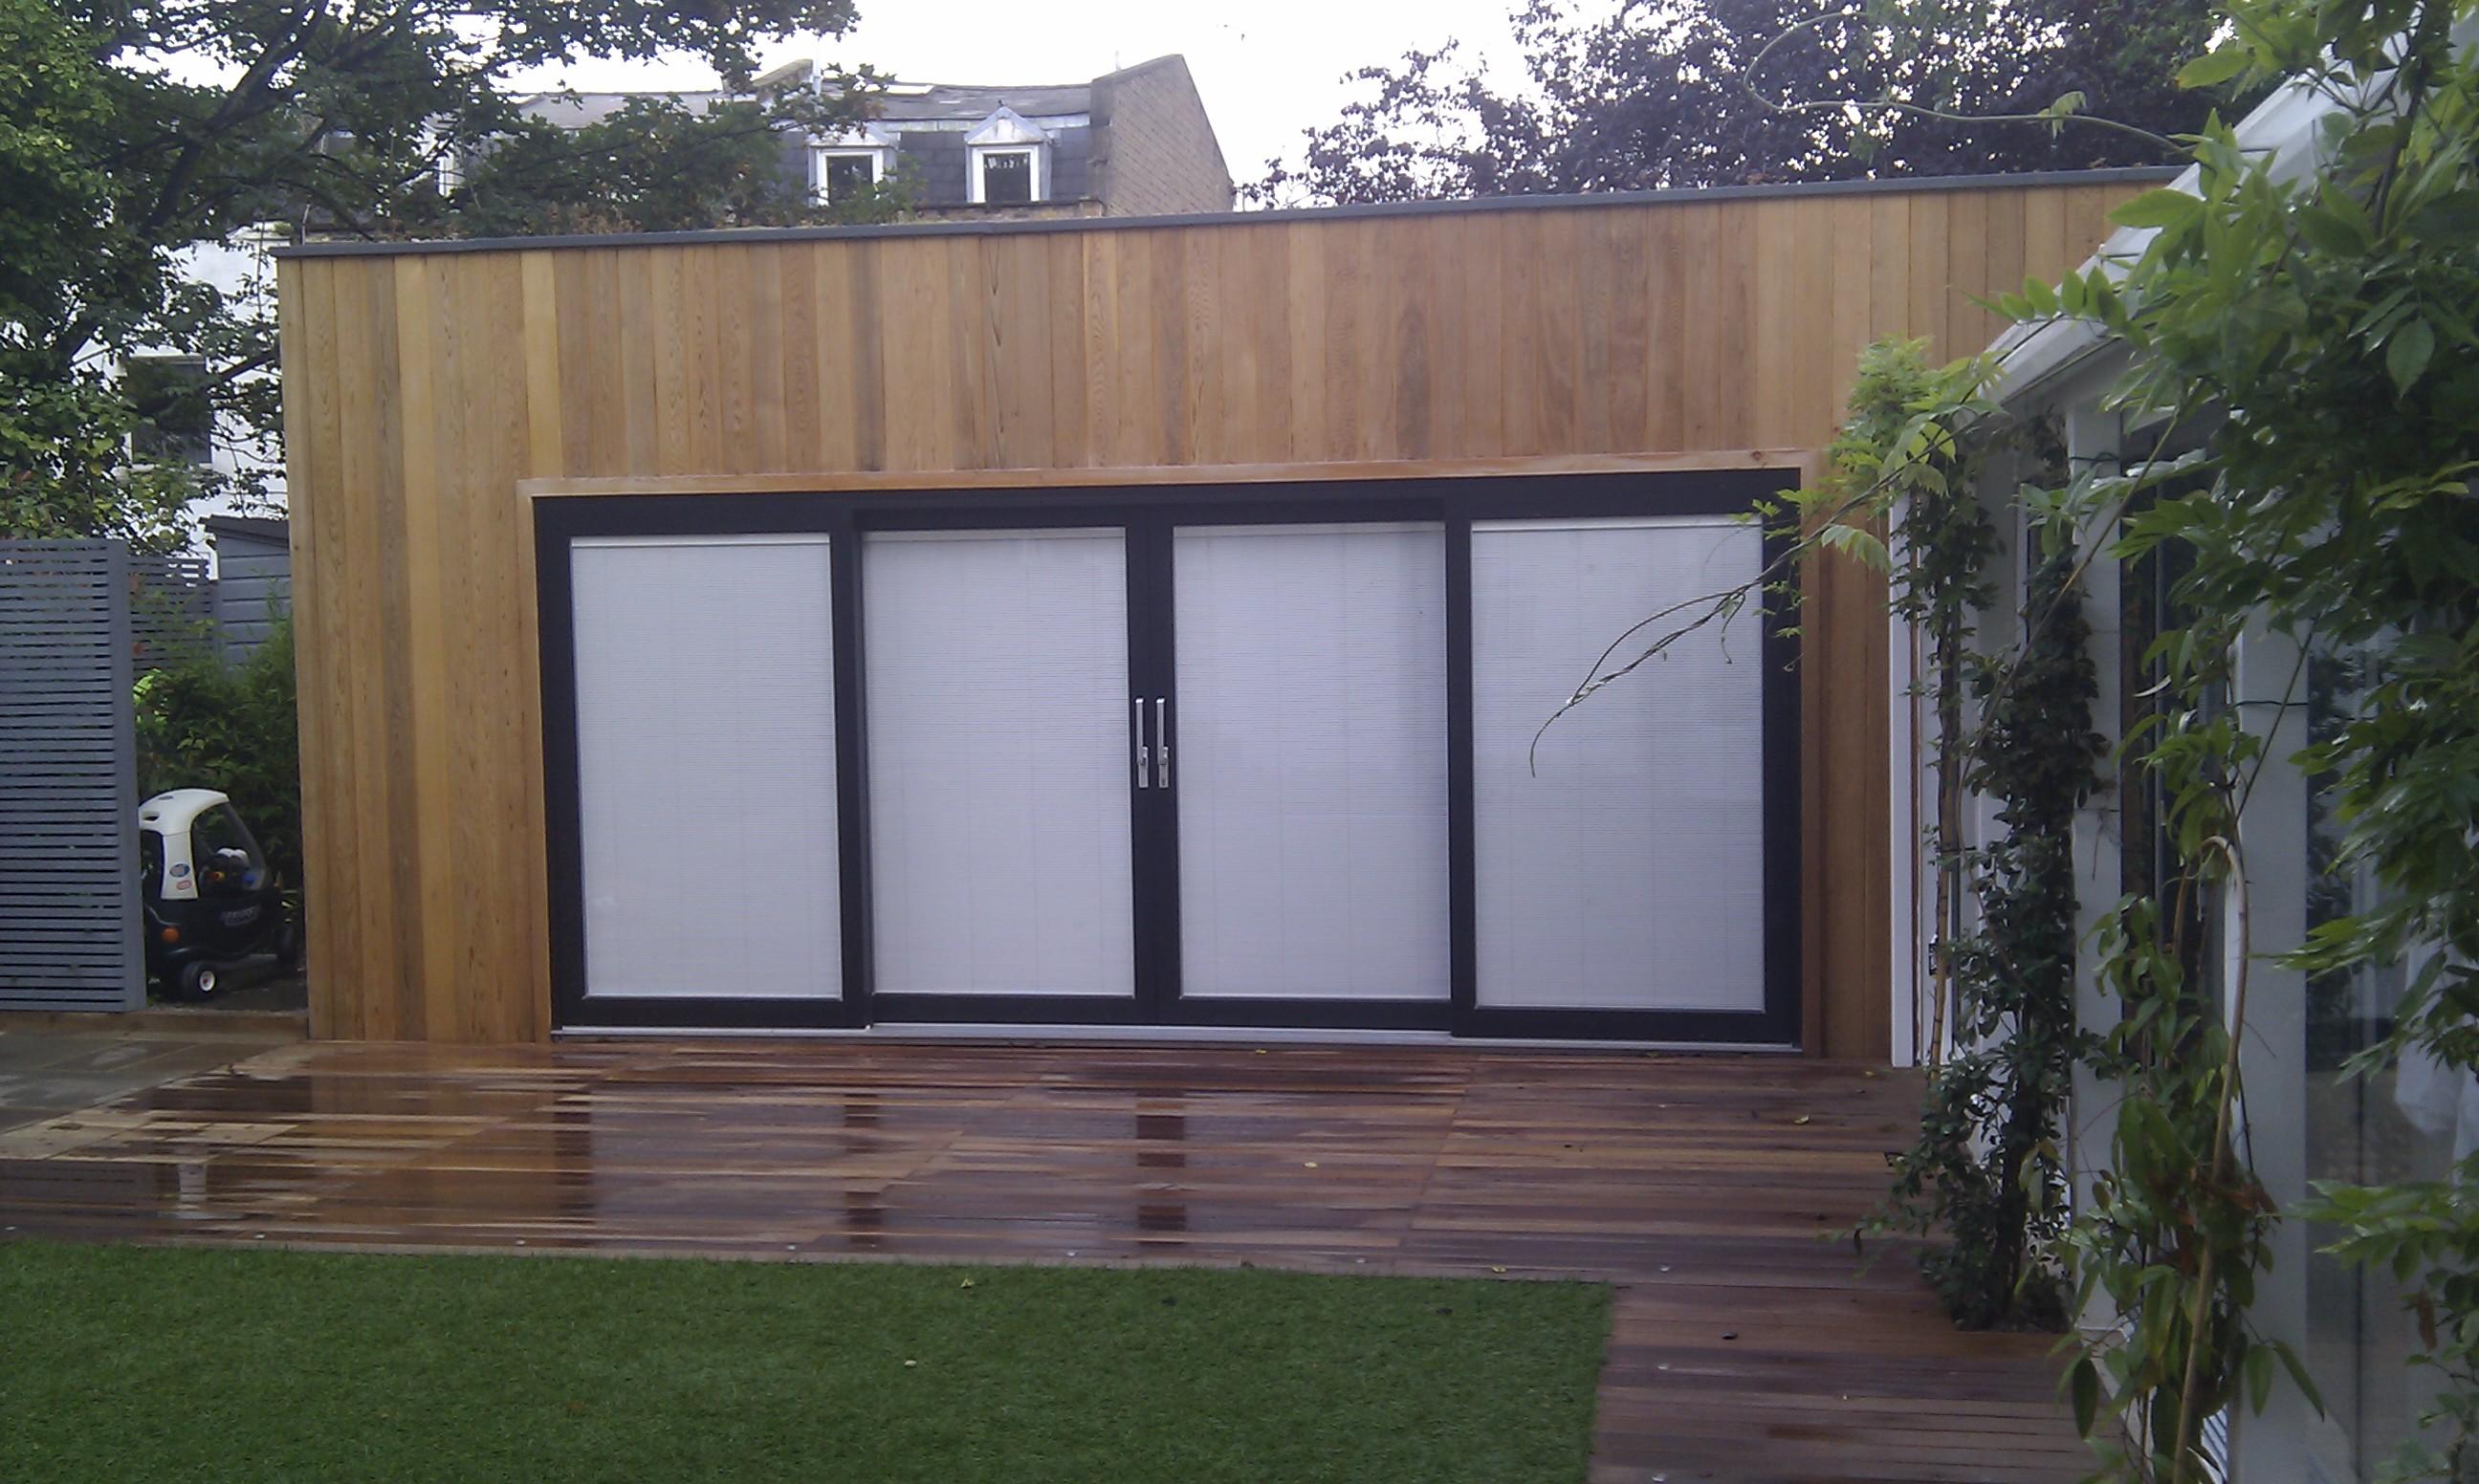 modern garden design london slatted grey privacy screen sandstone paving easy grass balau hardwood decking (36)